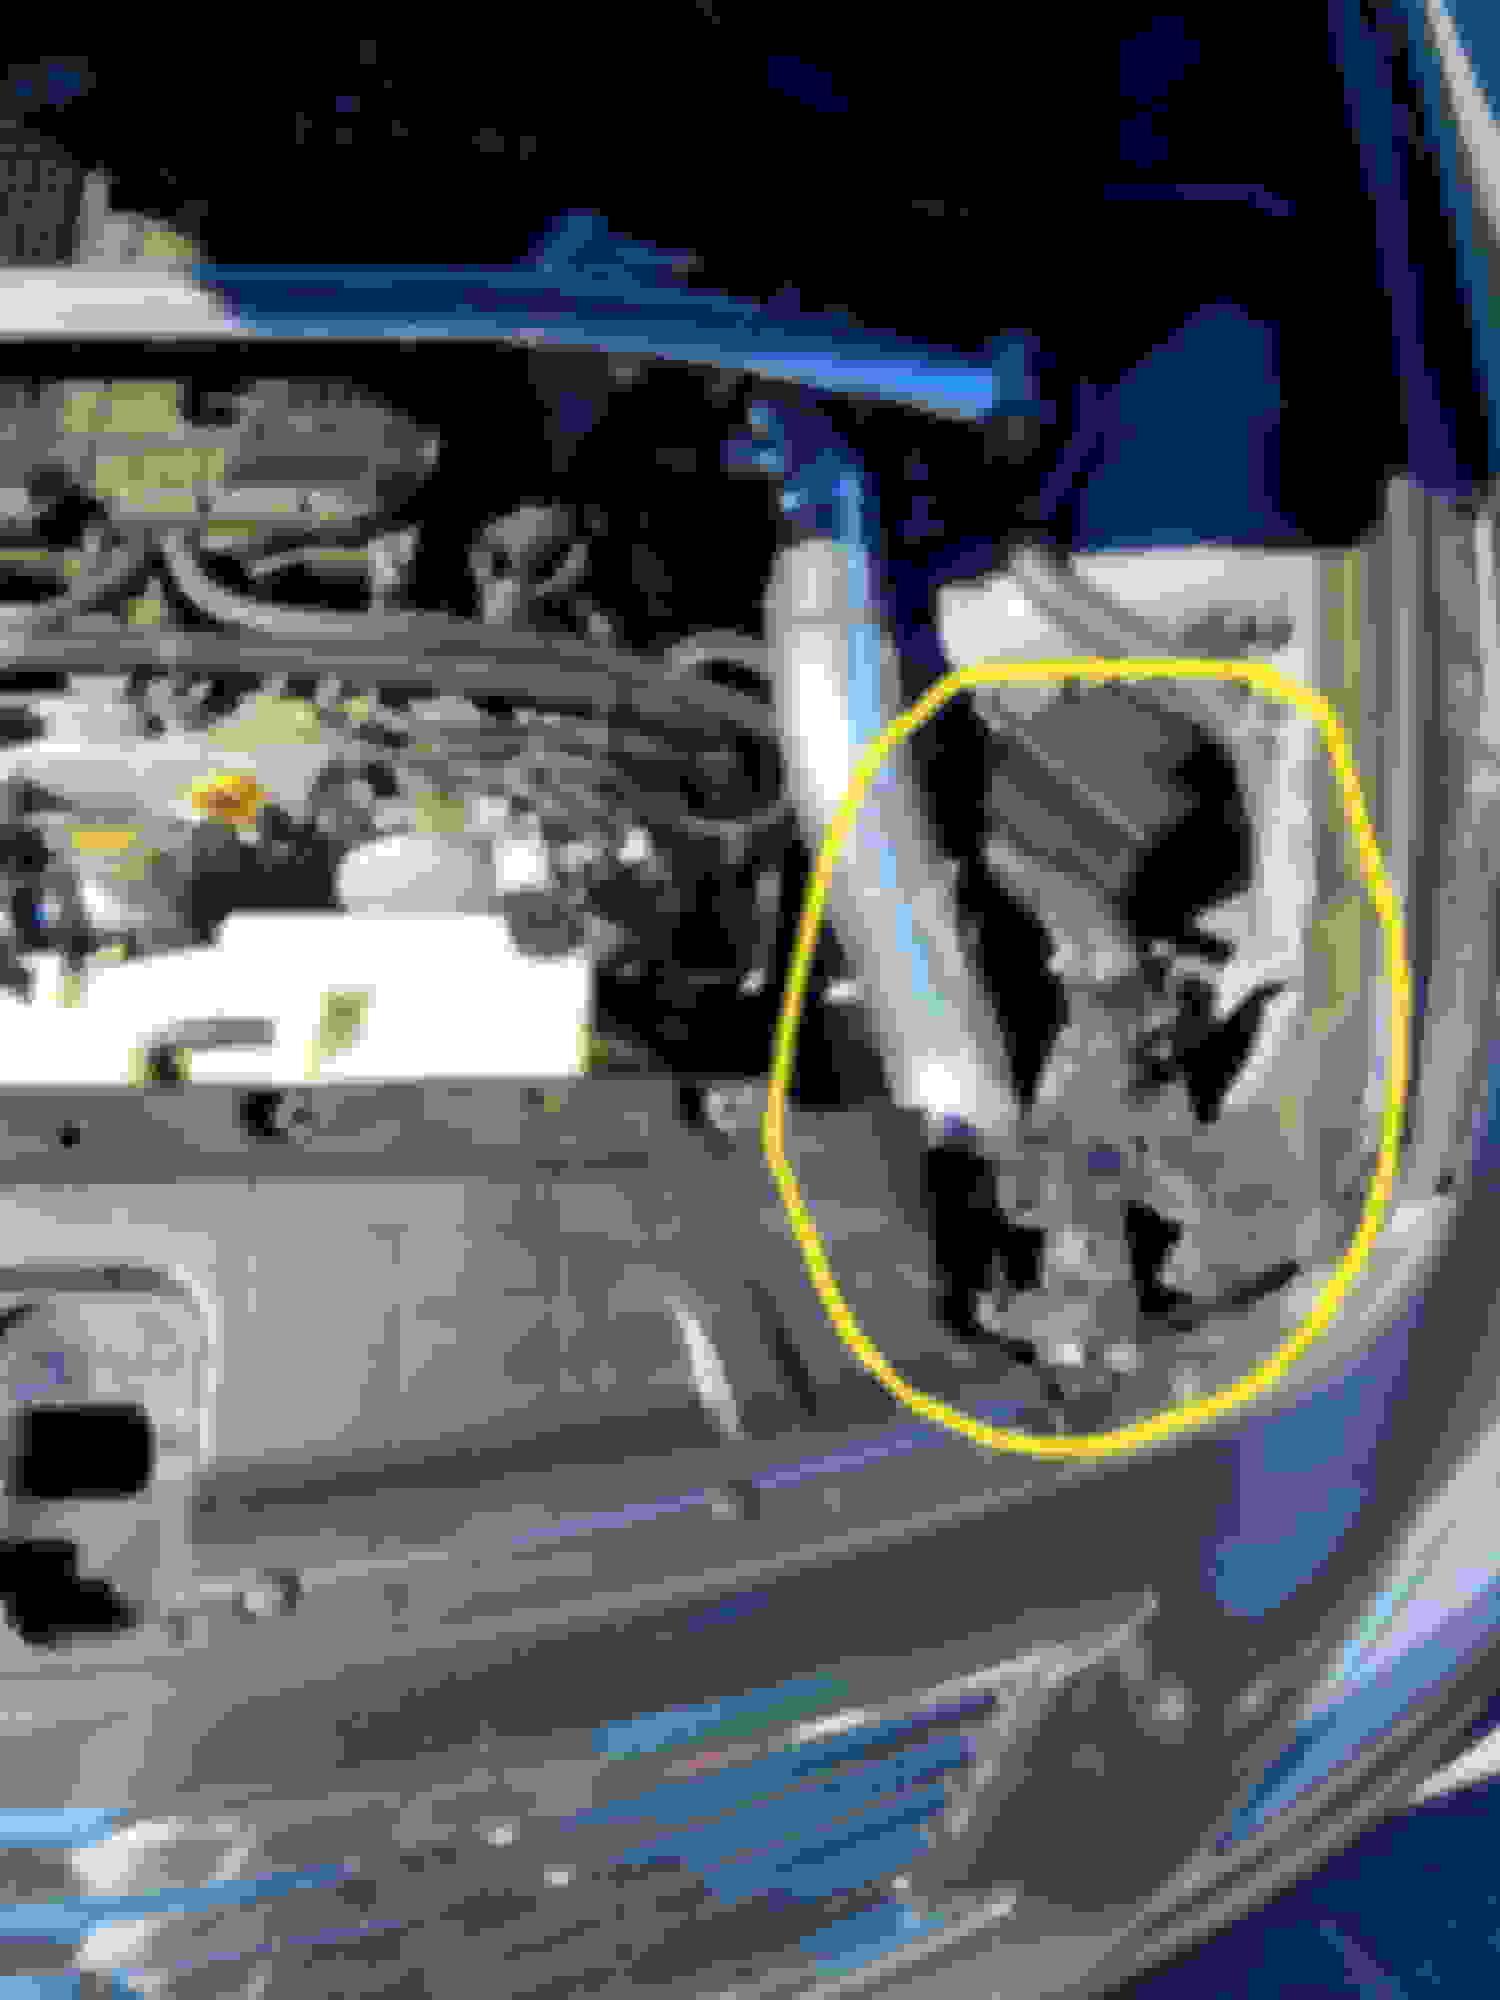 EPS Big Bore Throttle body Problem - MyG37